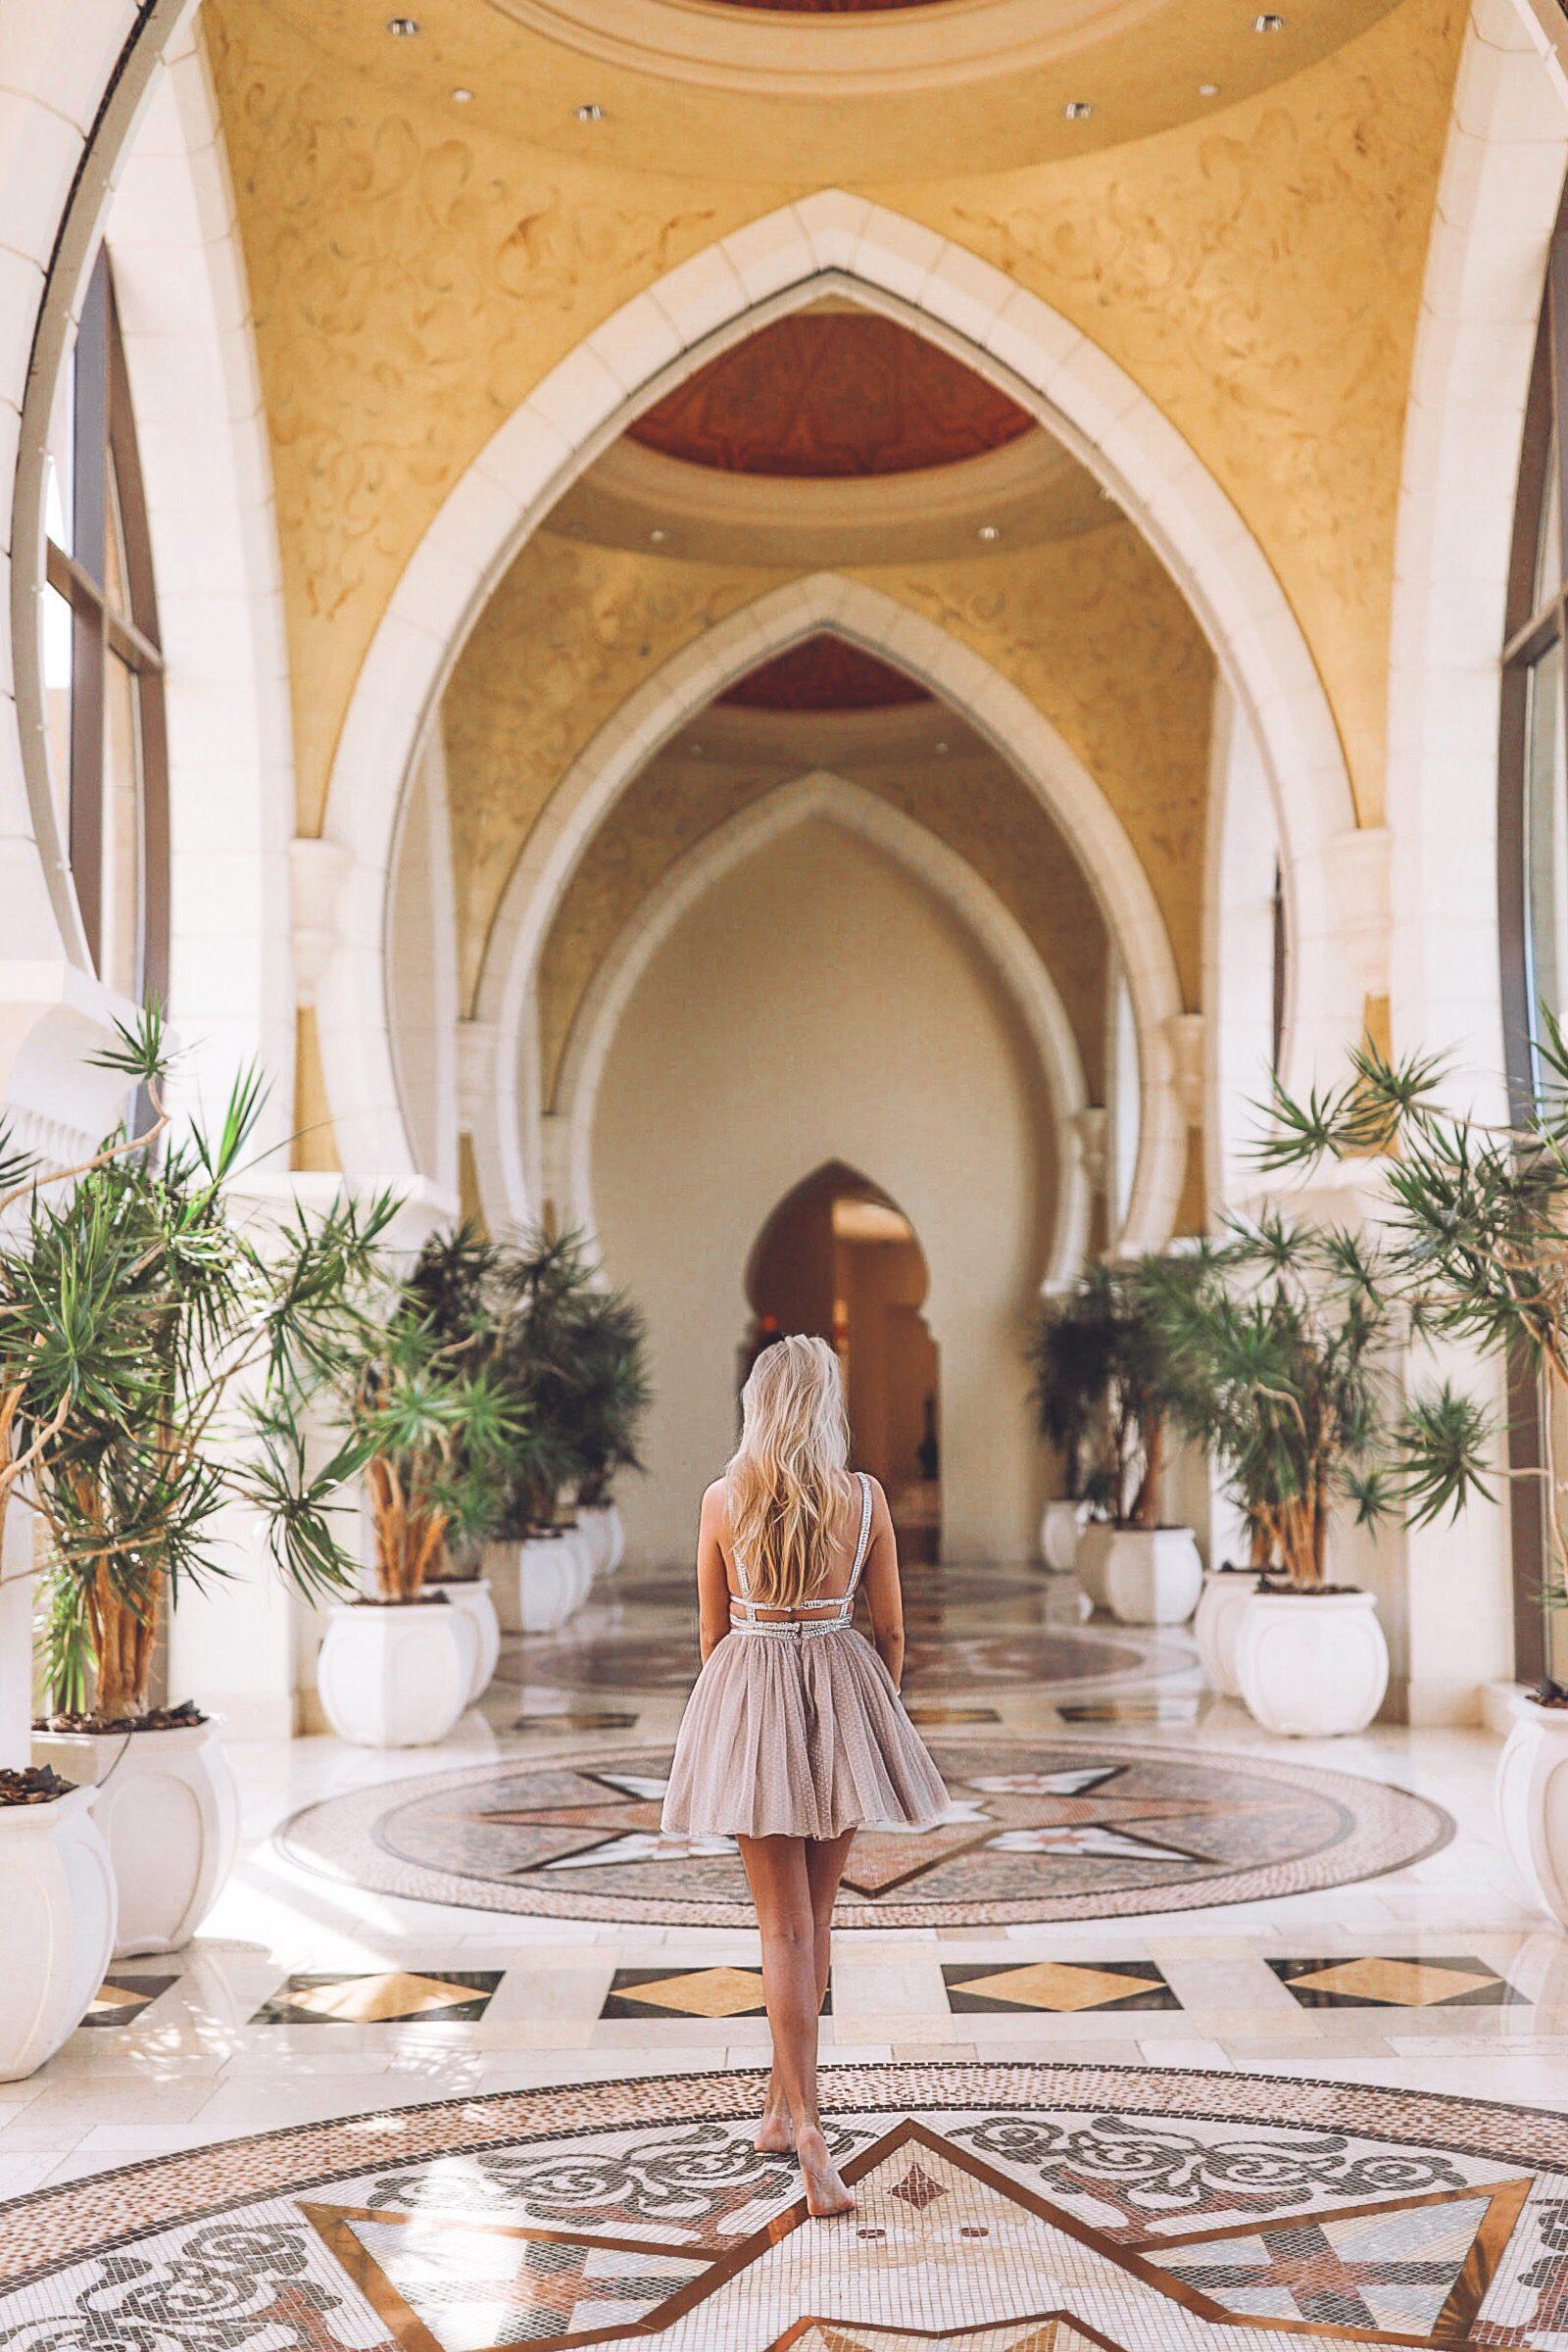 One&Only Royal Mirage - Voyager à Dubaï